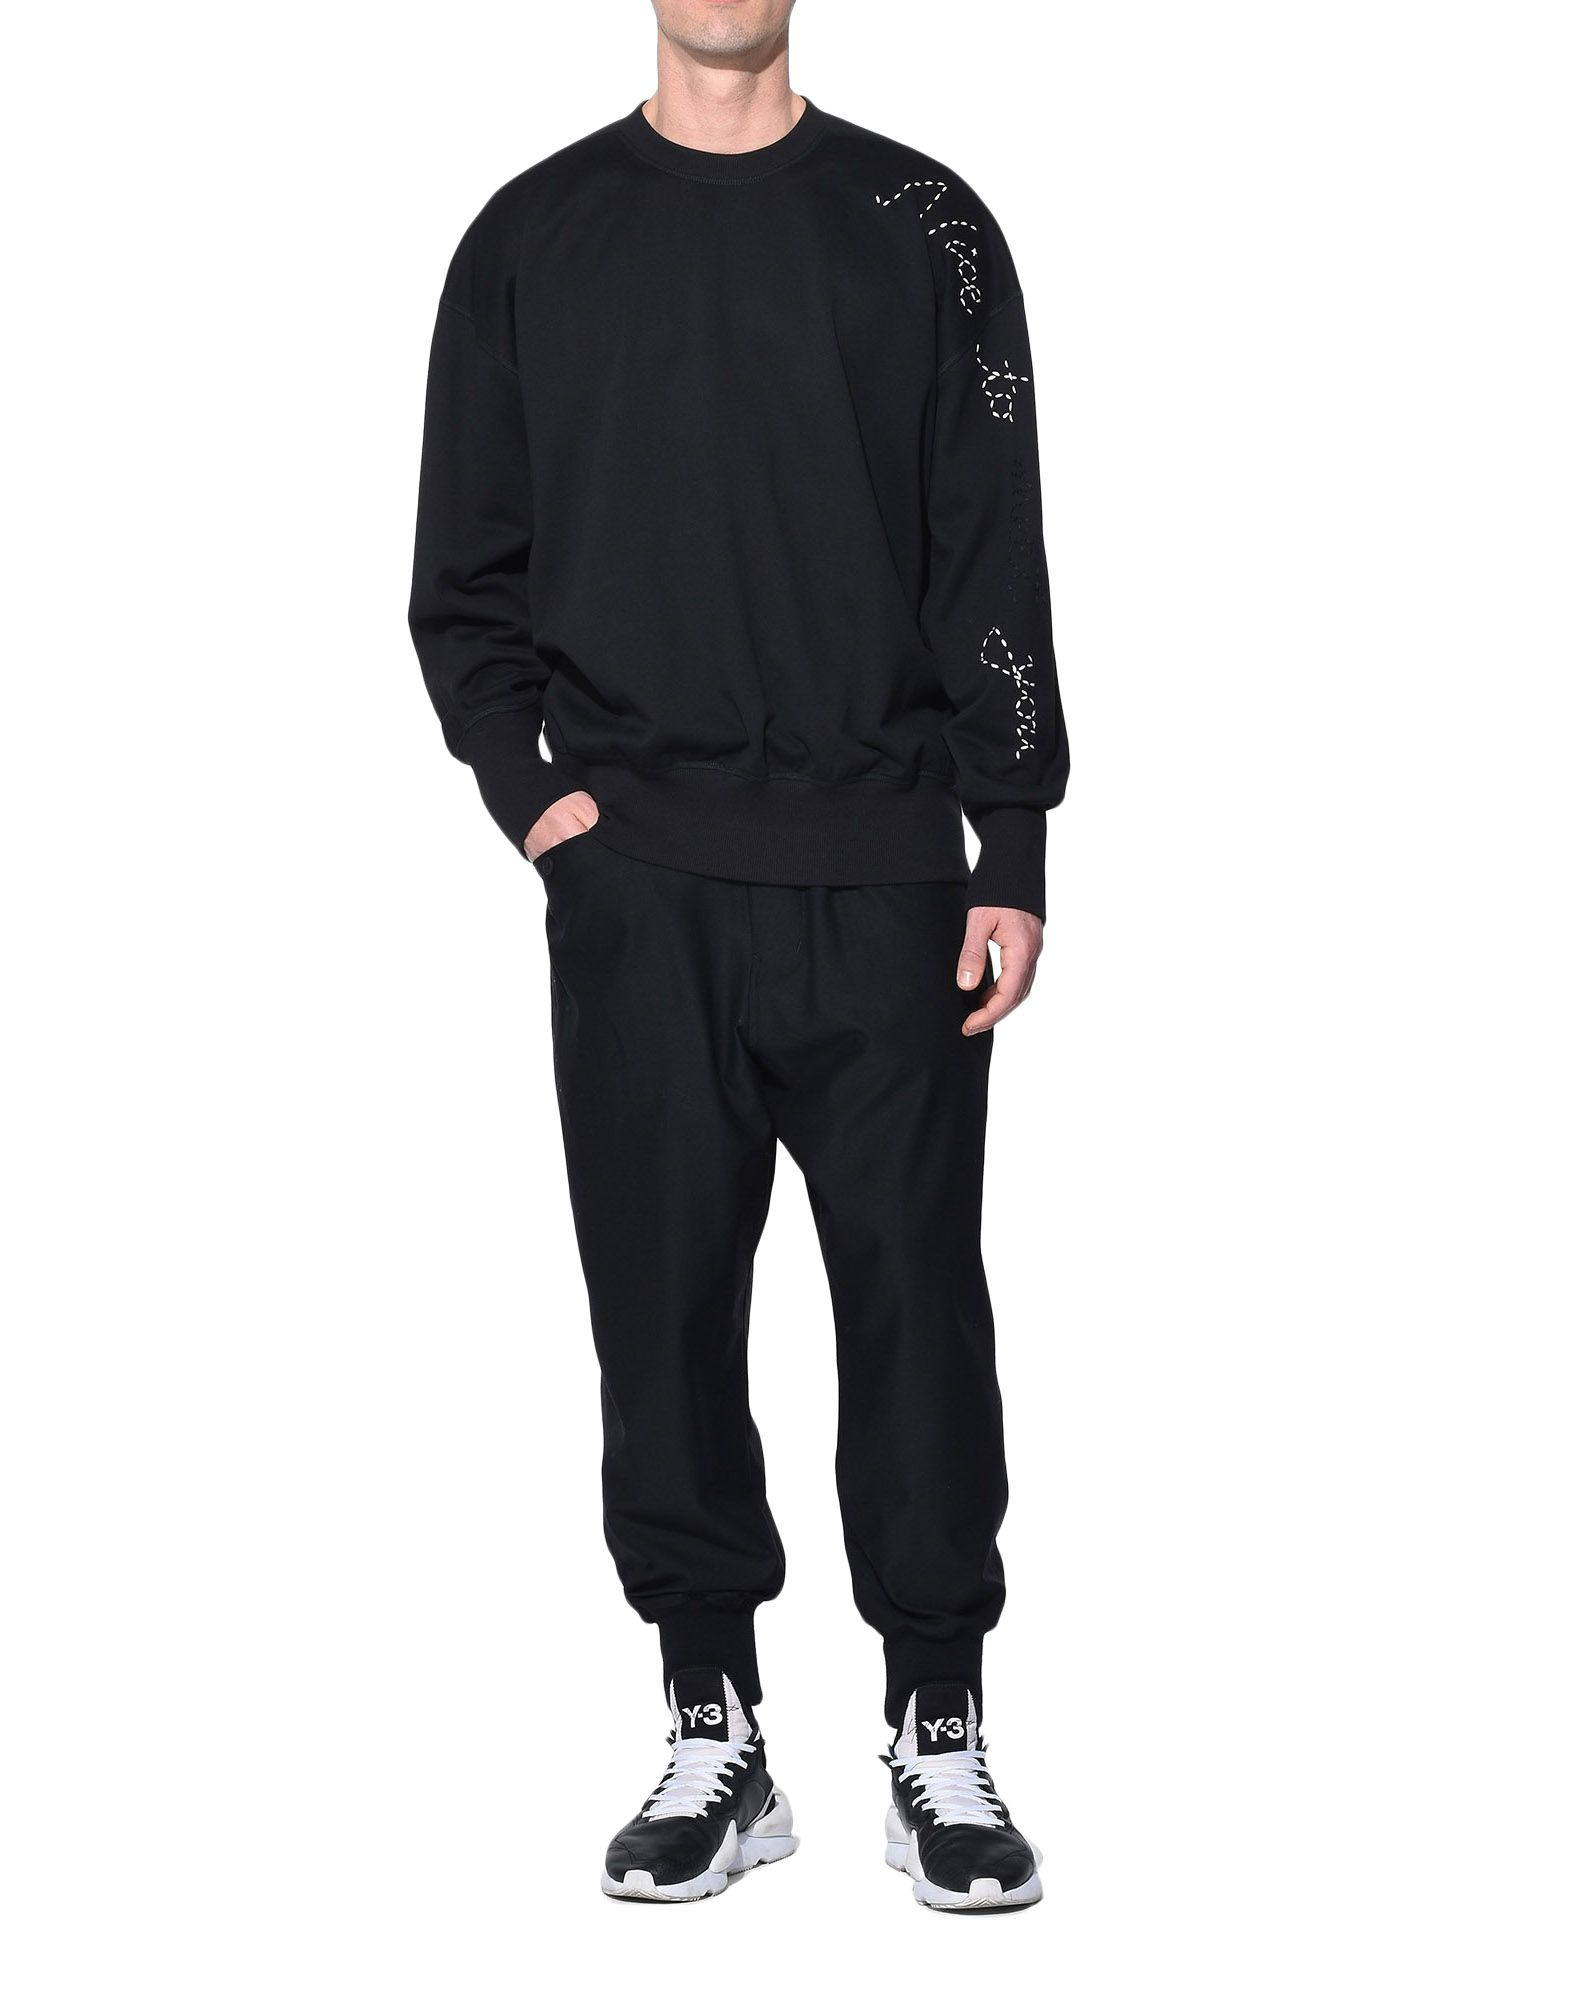 Y-3 Y-3 Sashiko Slogan Sweater Sweatshirt Man a